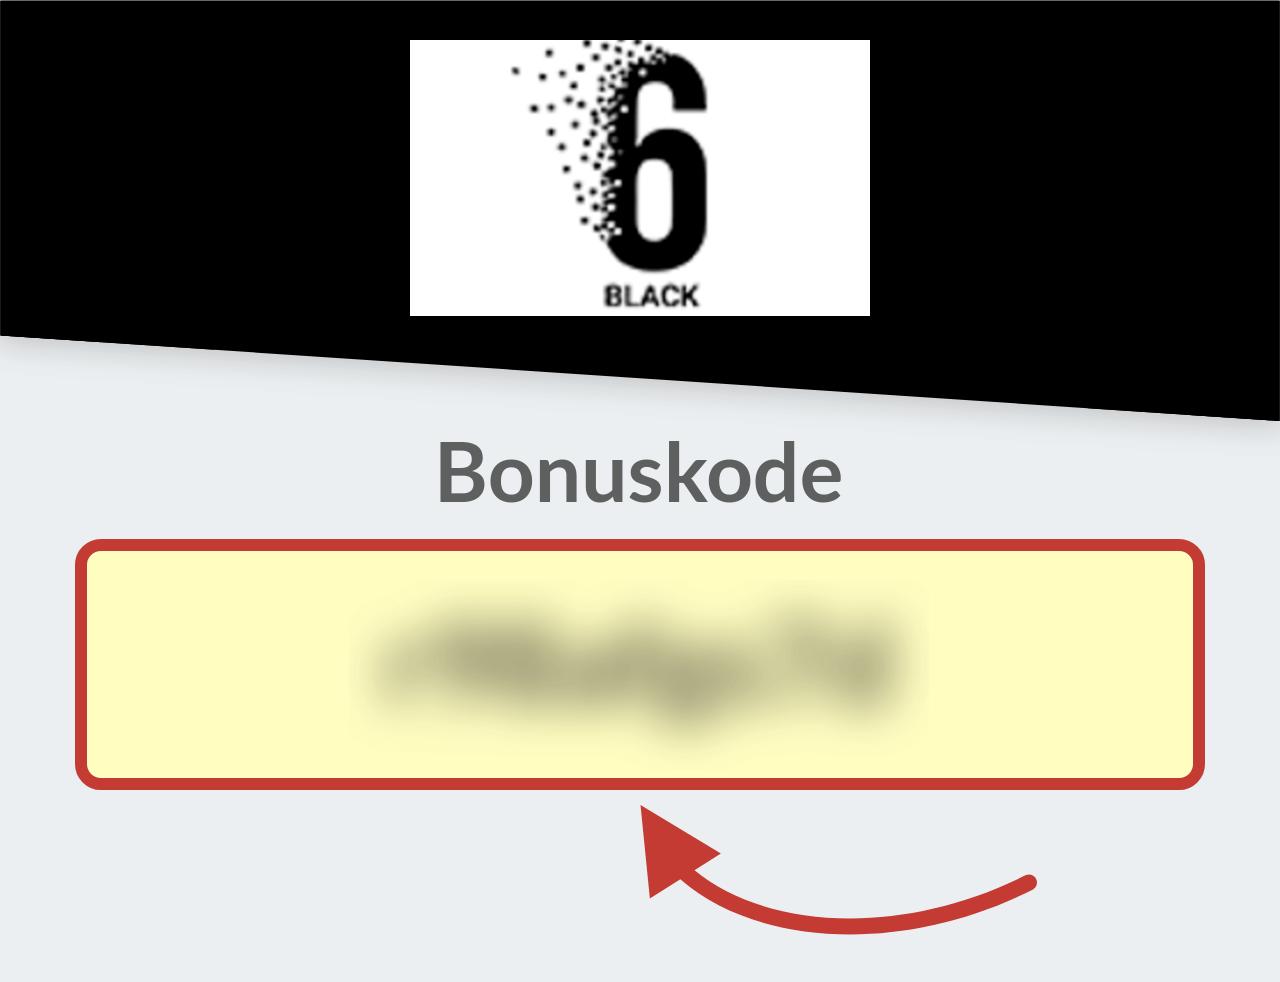 6Black Casino Bonuskode